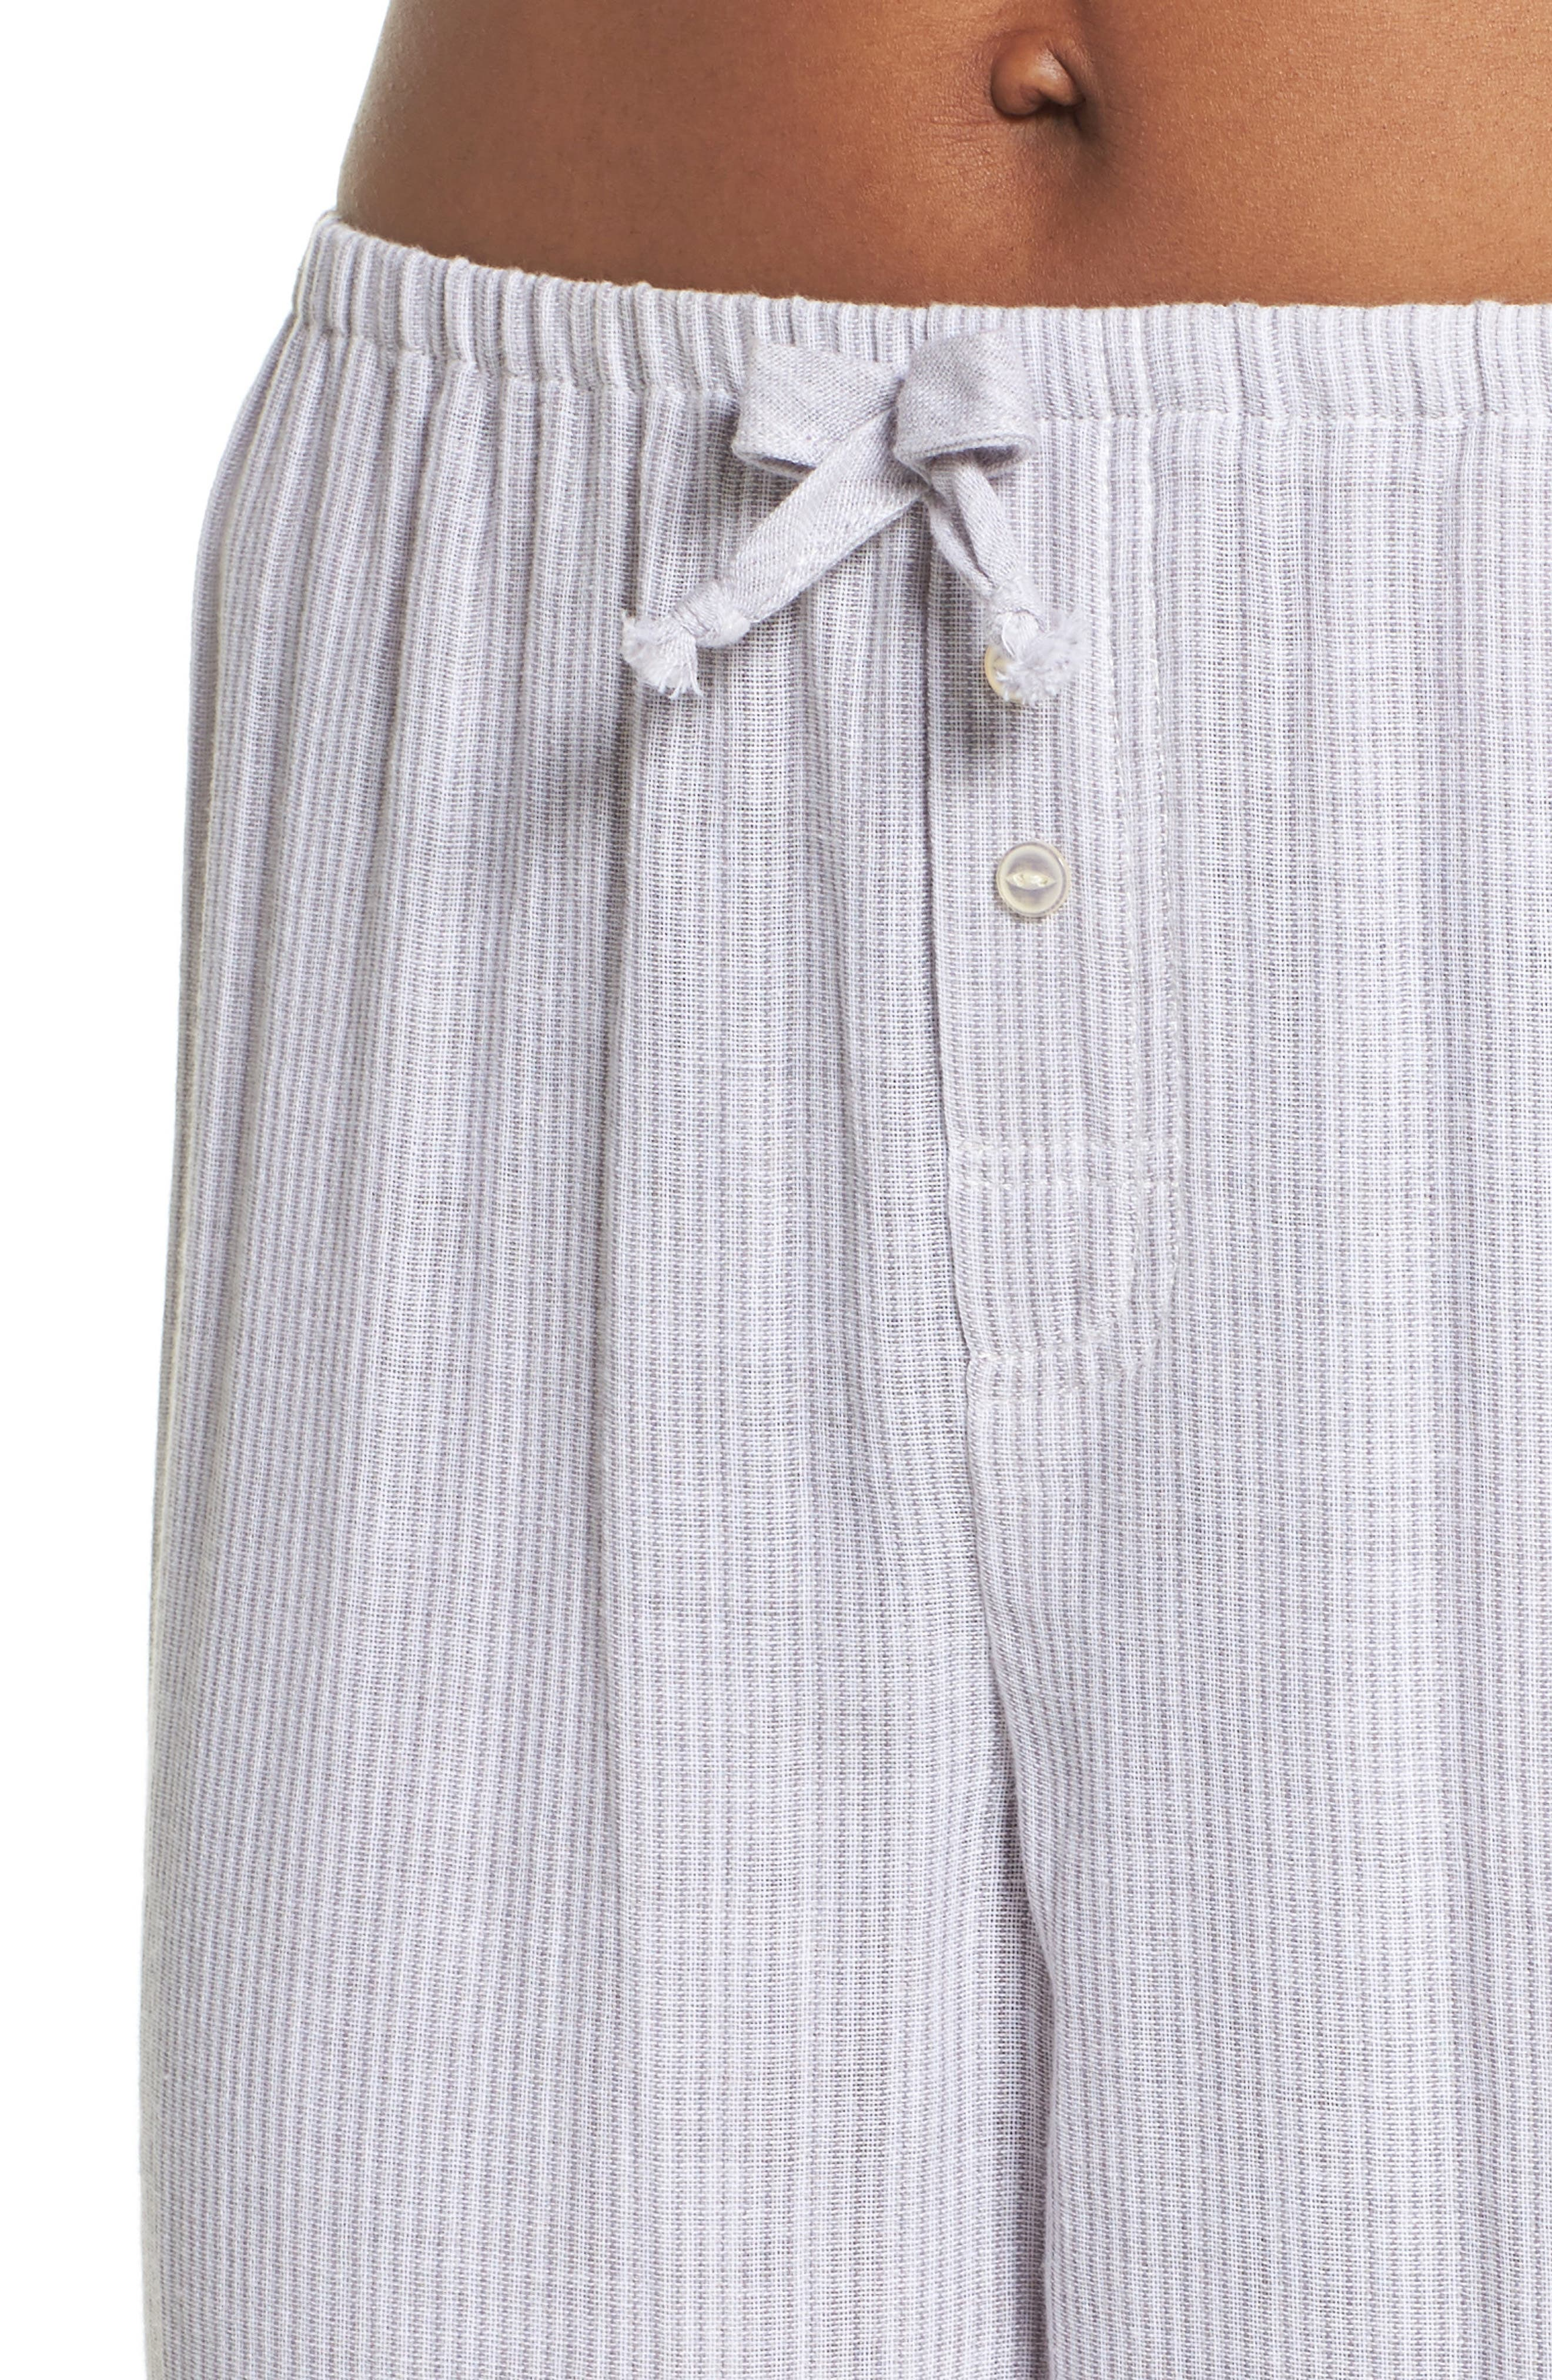 Stripe Pajama Pants,                             Alternate thumbnail 6, color,                             Grey/ White